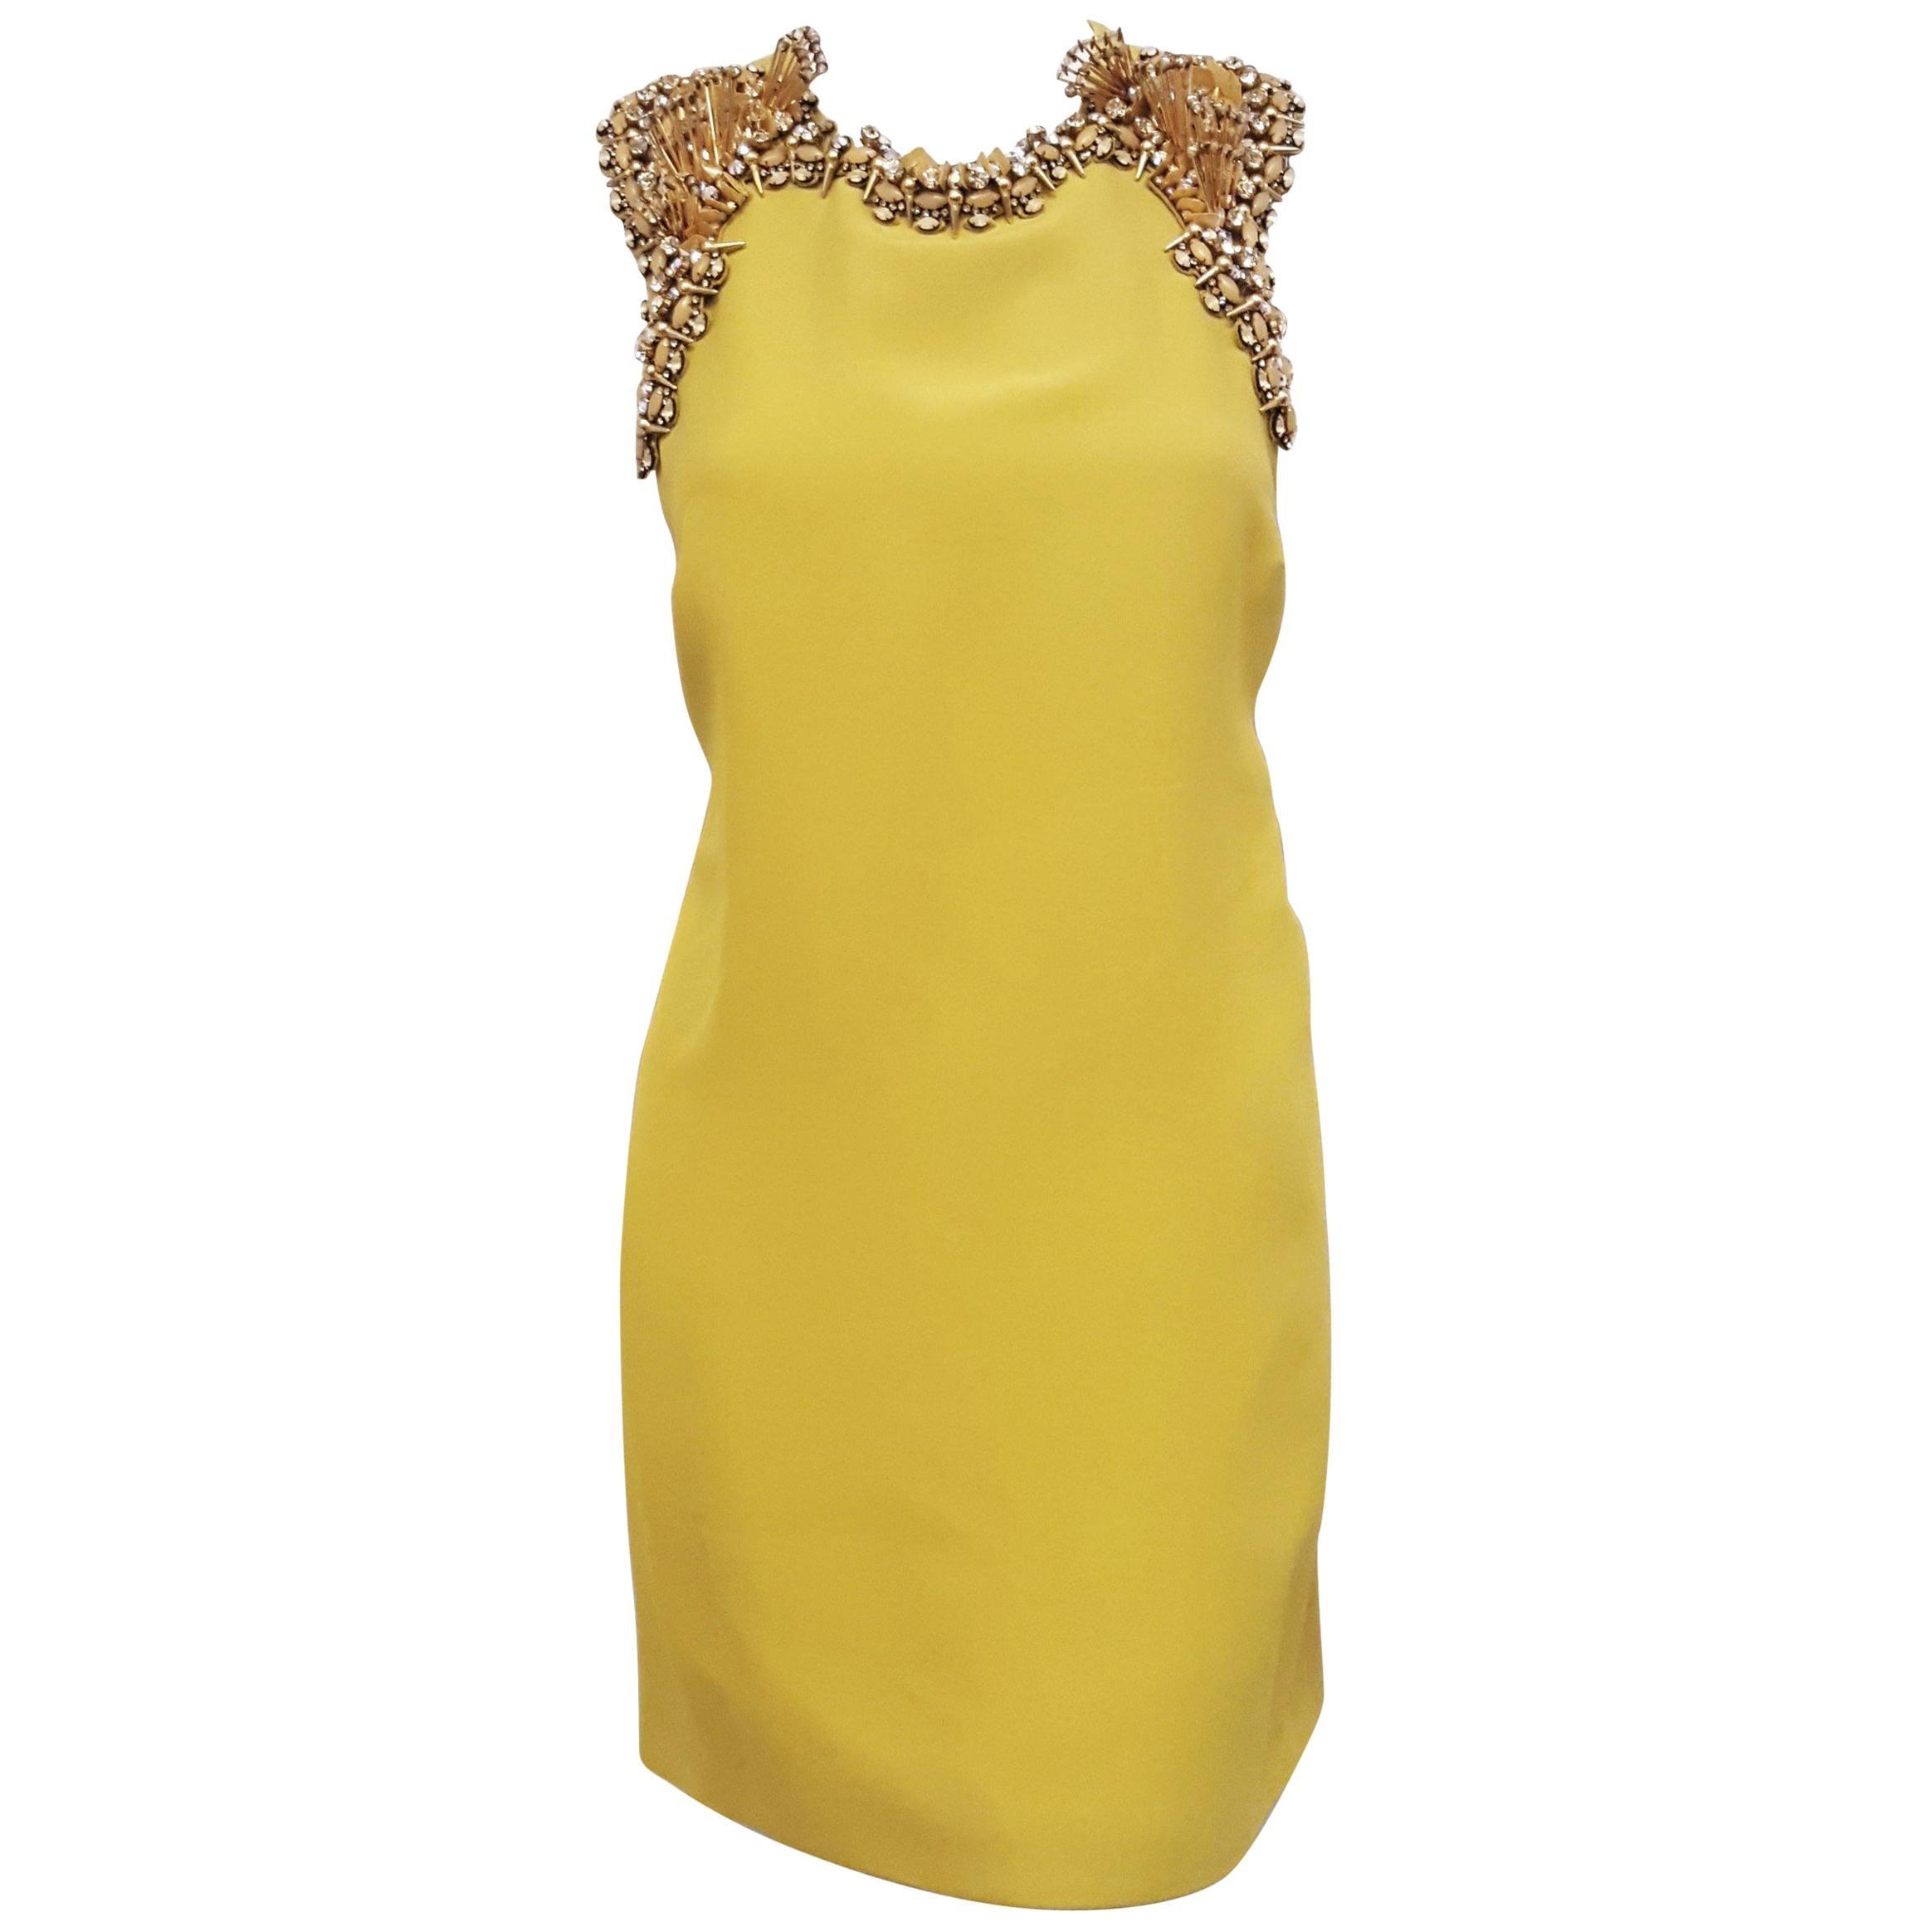 Gucci Razorback A-Line Chartreuse Silk Beaded Accent Dress 44 EU